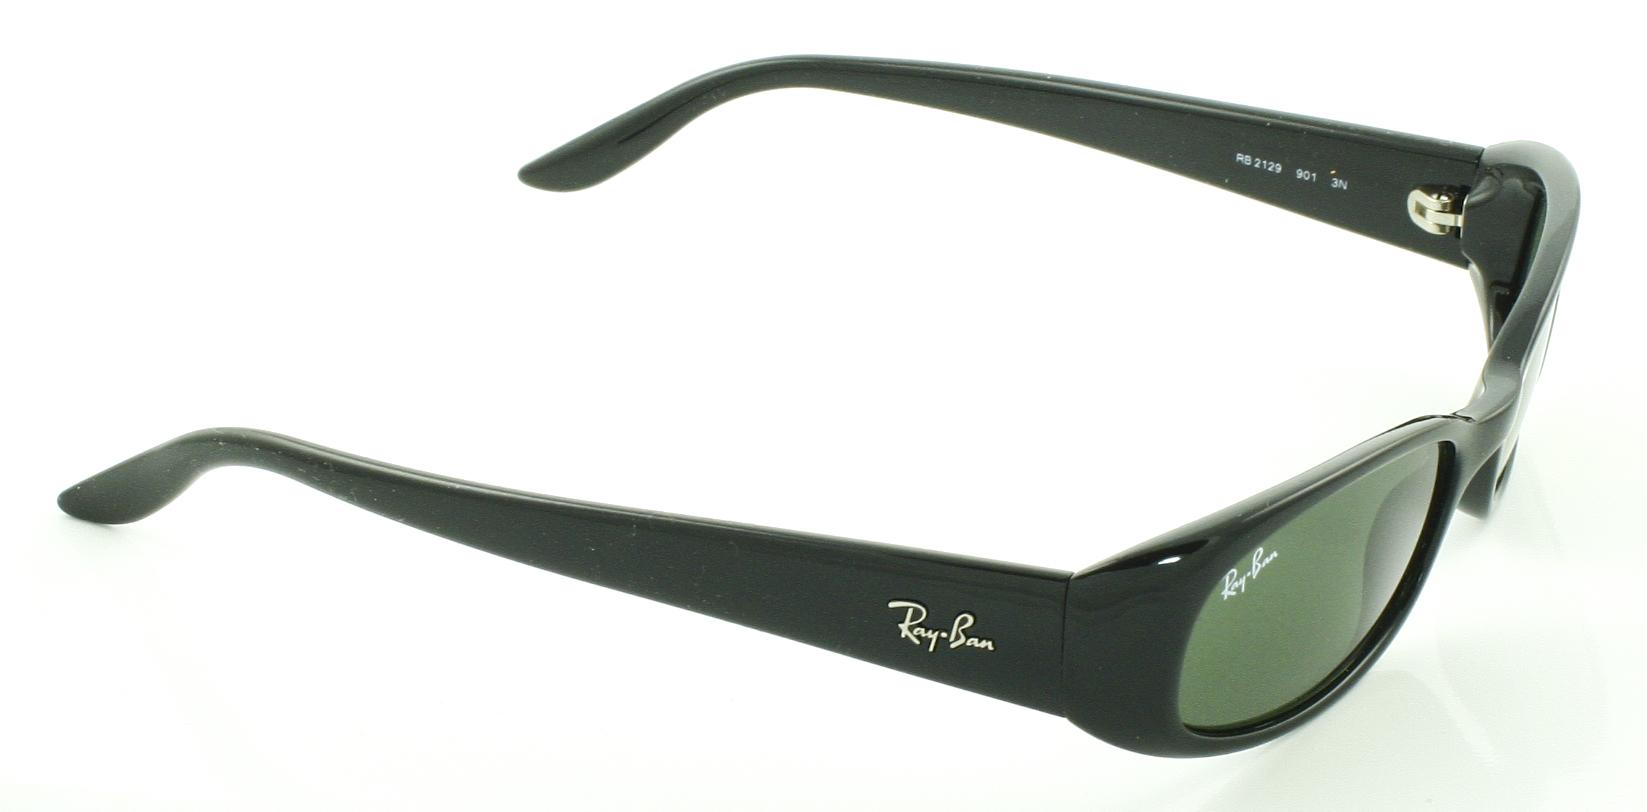 Ray ban sunglasses quikr - Ray Ban Sunglasses Kenya